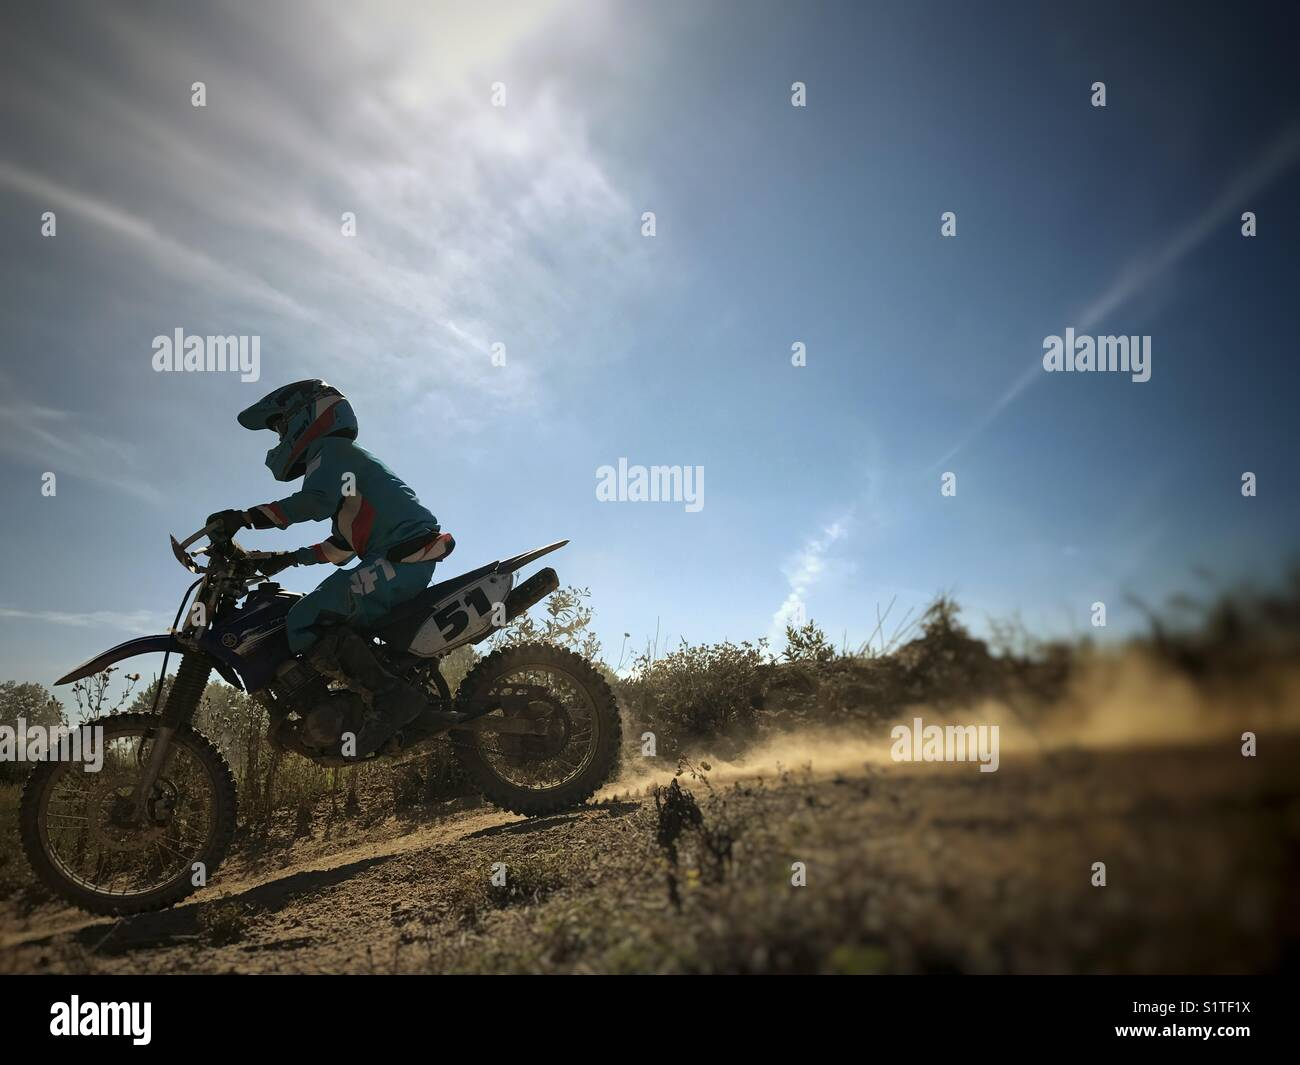 Boy riding a dirt bike in the summer sun. - Stock Image